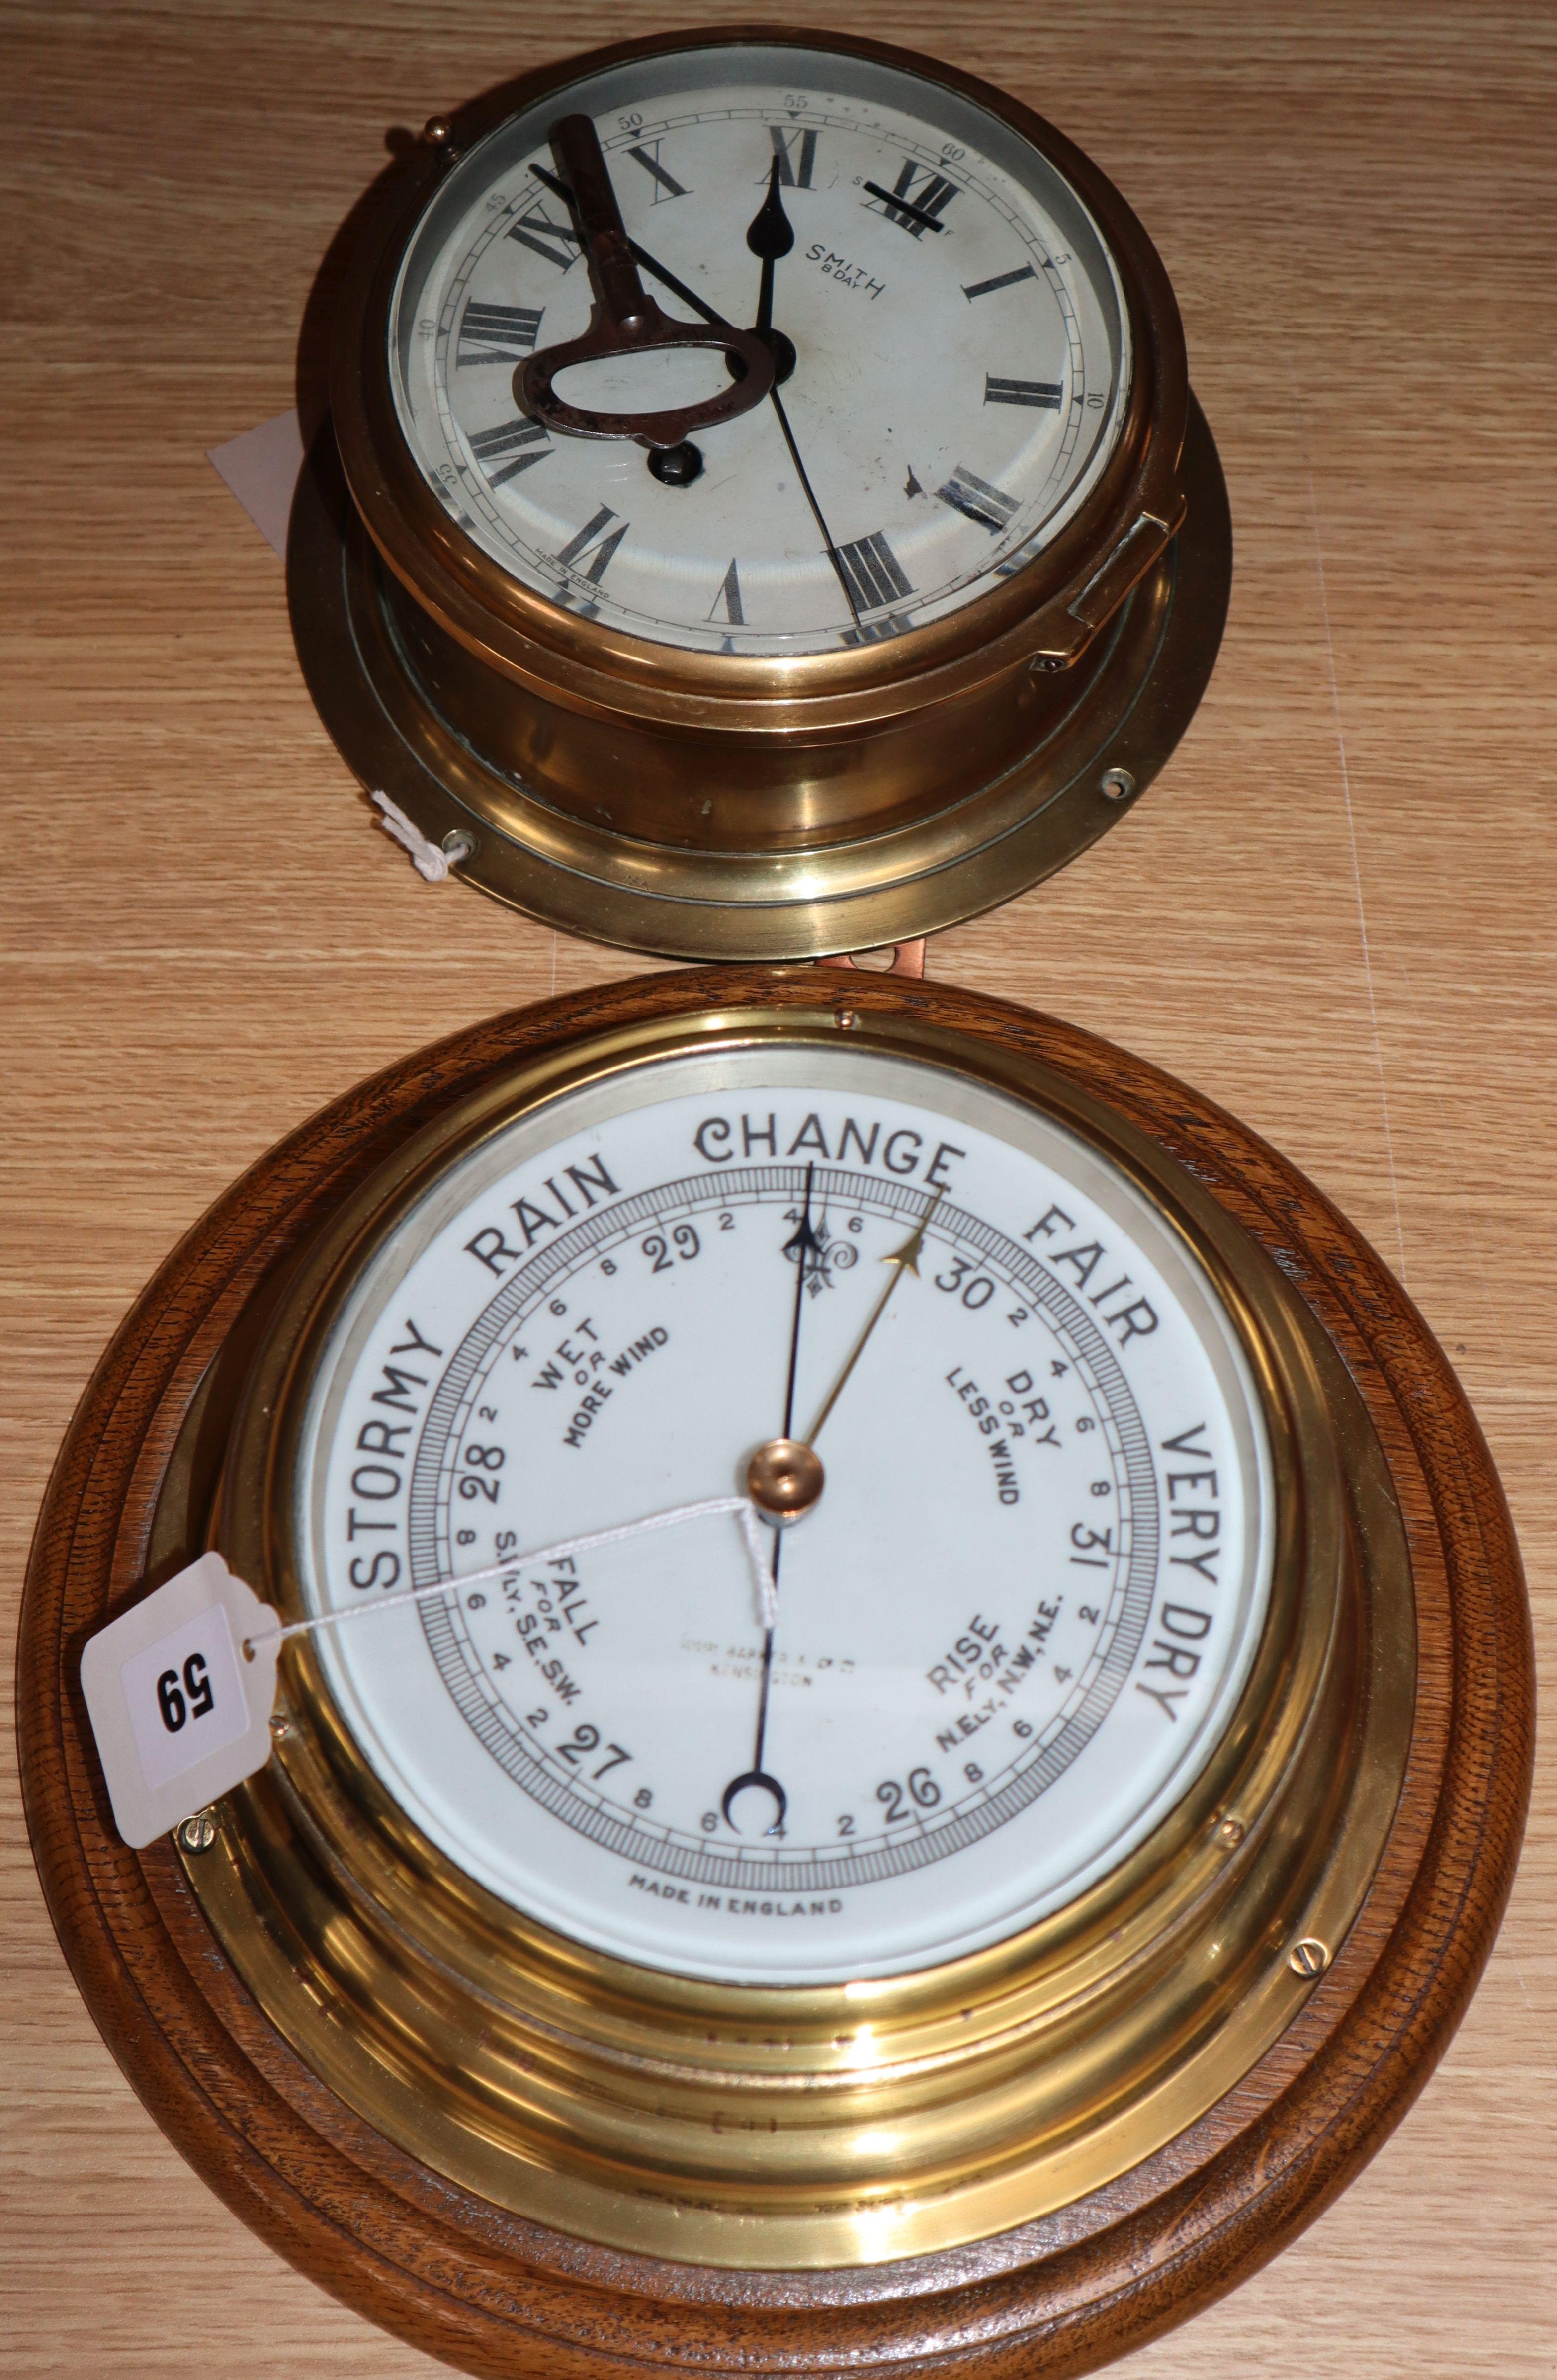 Lot 59 - A ship's aneroid barometer and a bulkhead clock